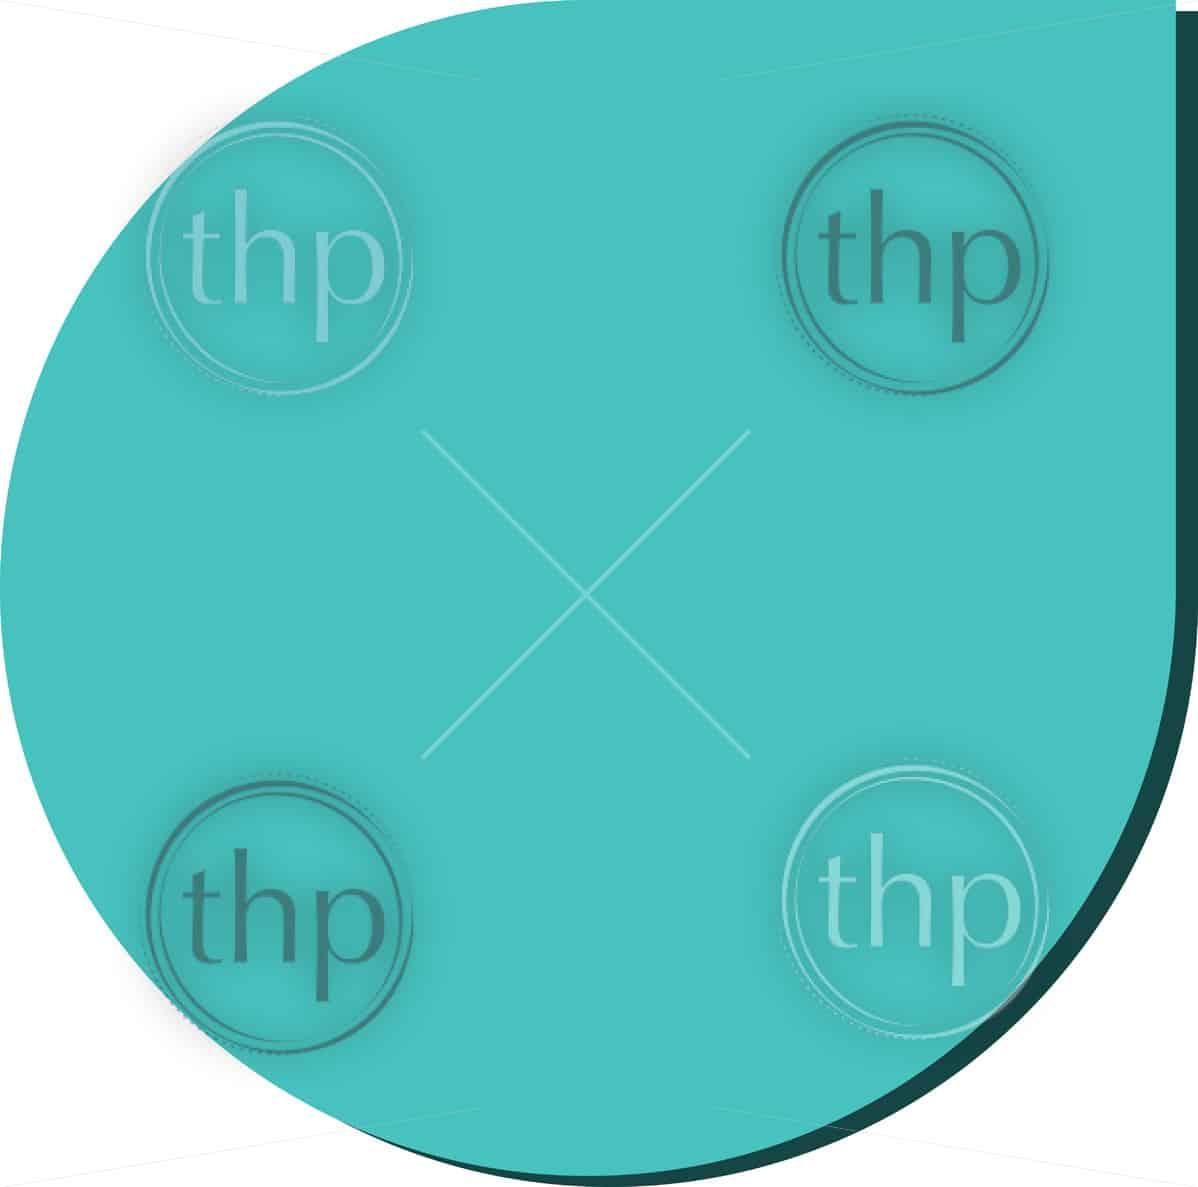 Modern flat design vector in water drop shape